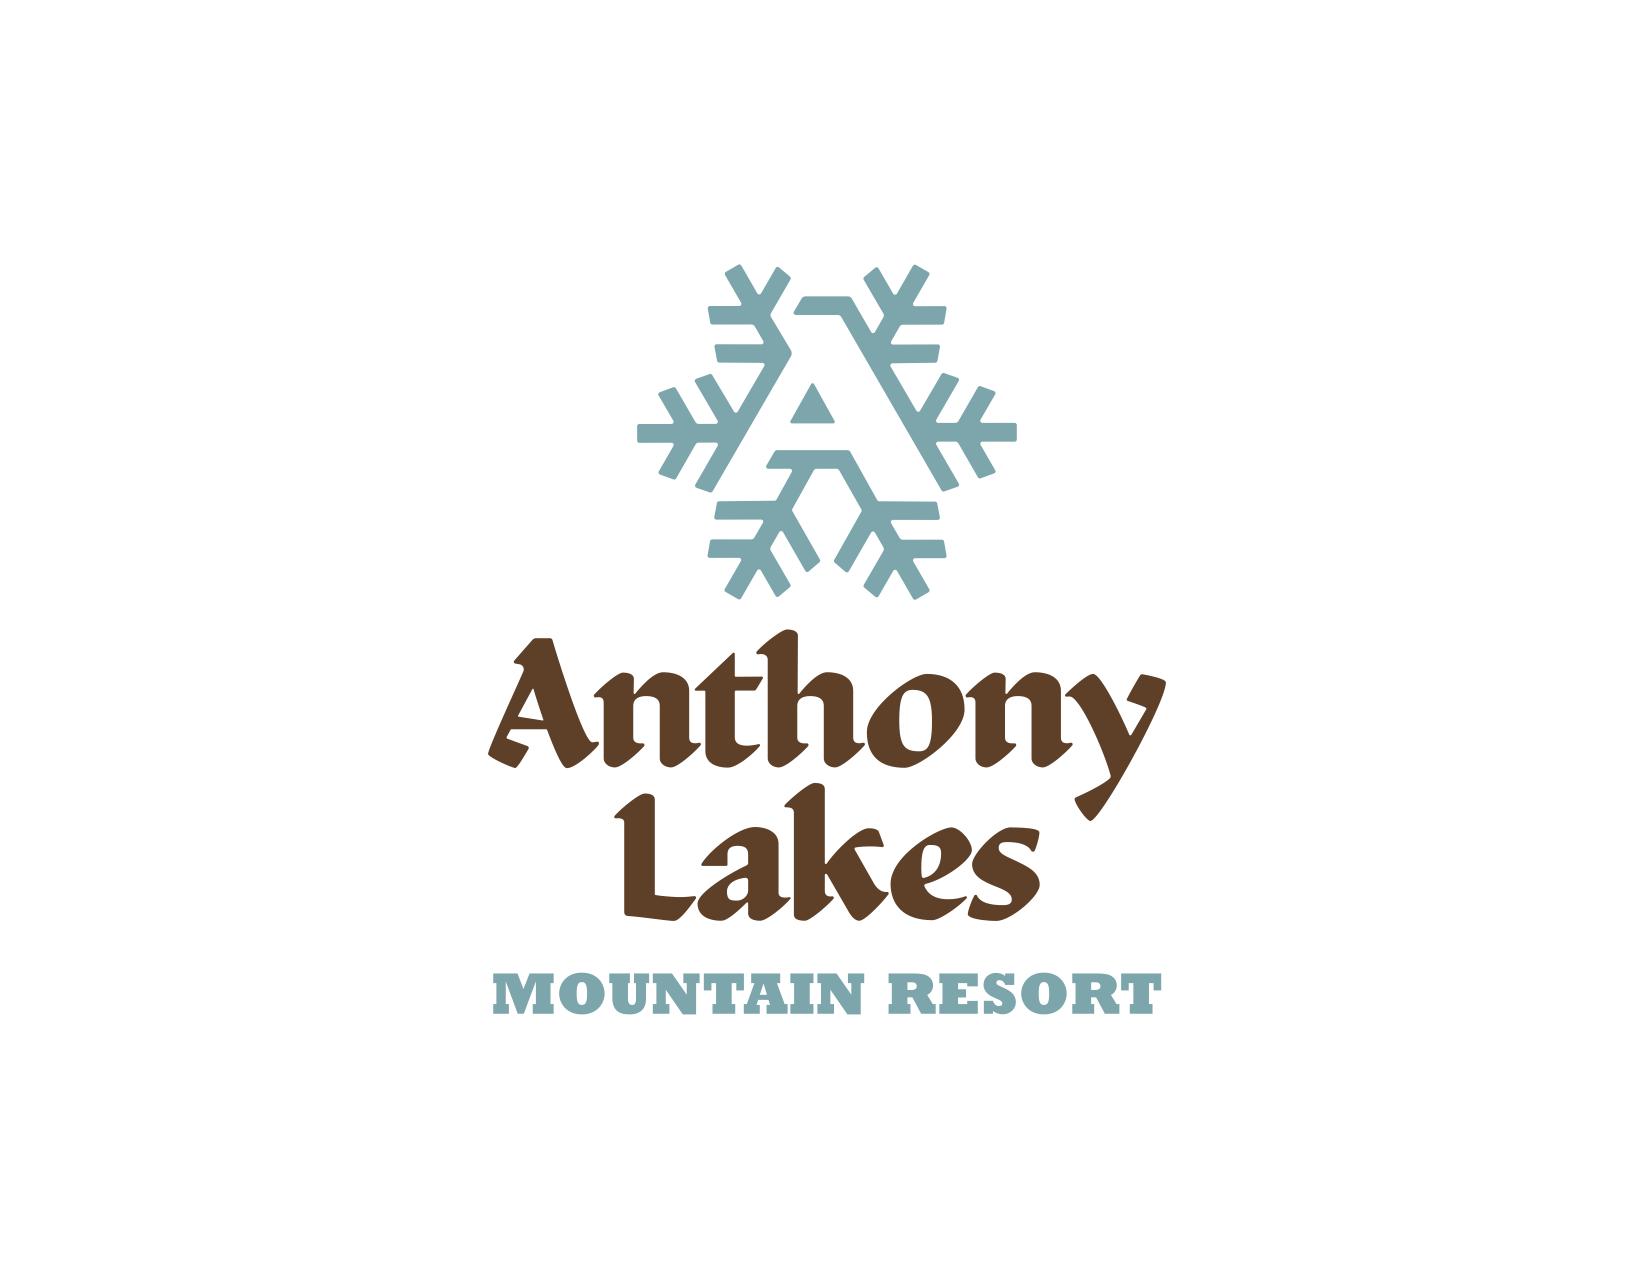 ANTHONY_LAKES_LOCKUP_mountain_resort